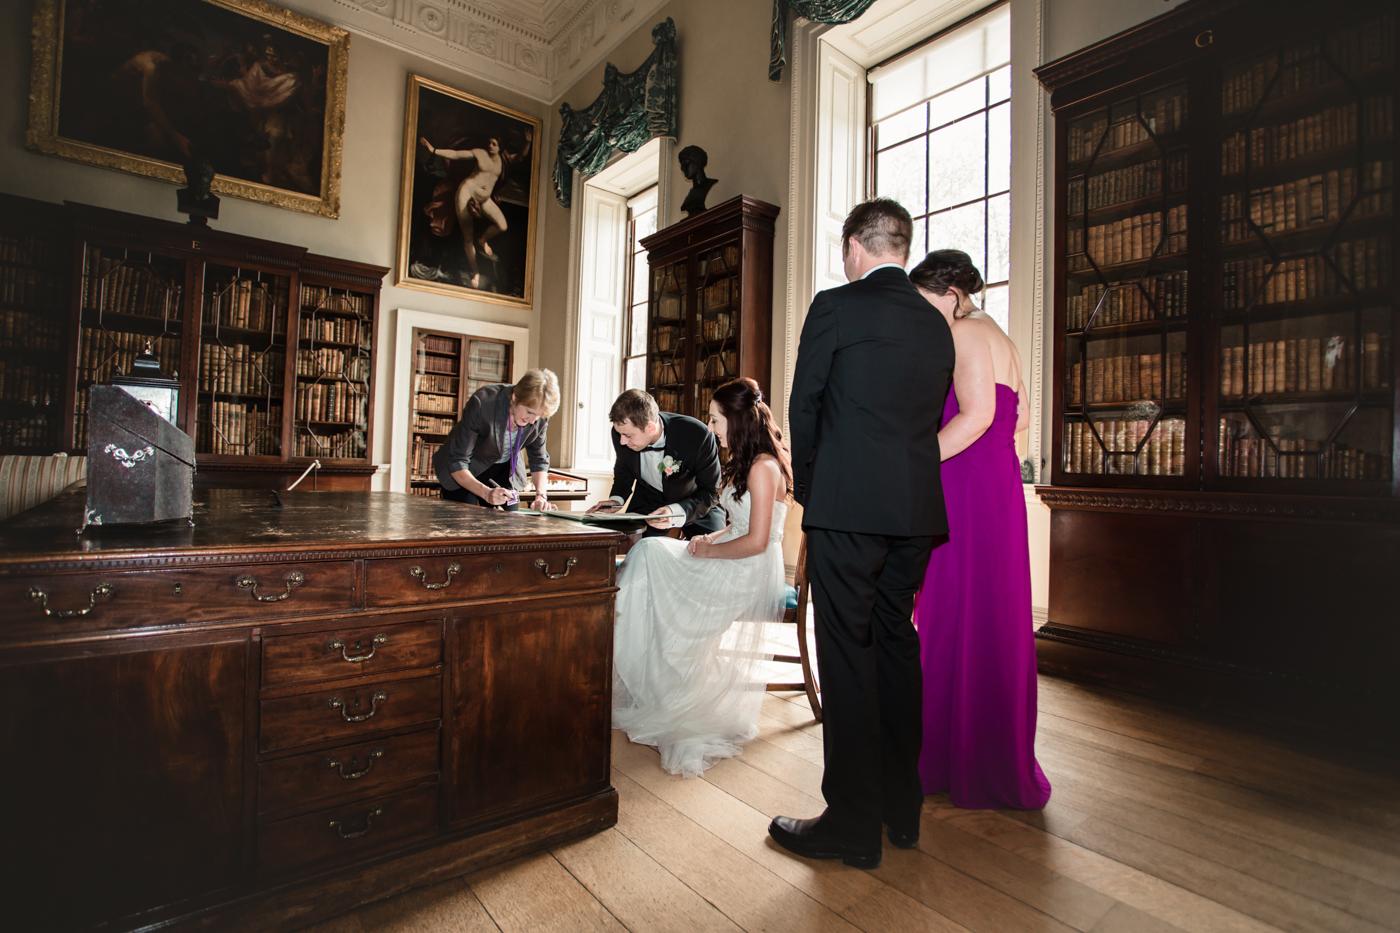 069 - Abi and Chris at Kedleston Hall - Wedding Photography by Mark Pugh www.markpugh.com - 0194.JPG